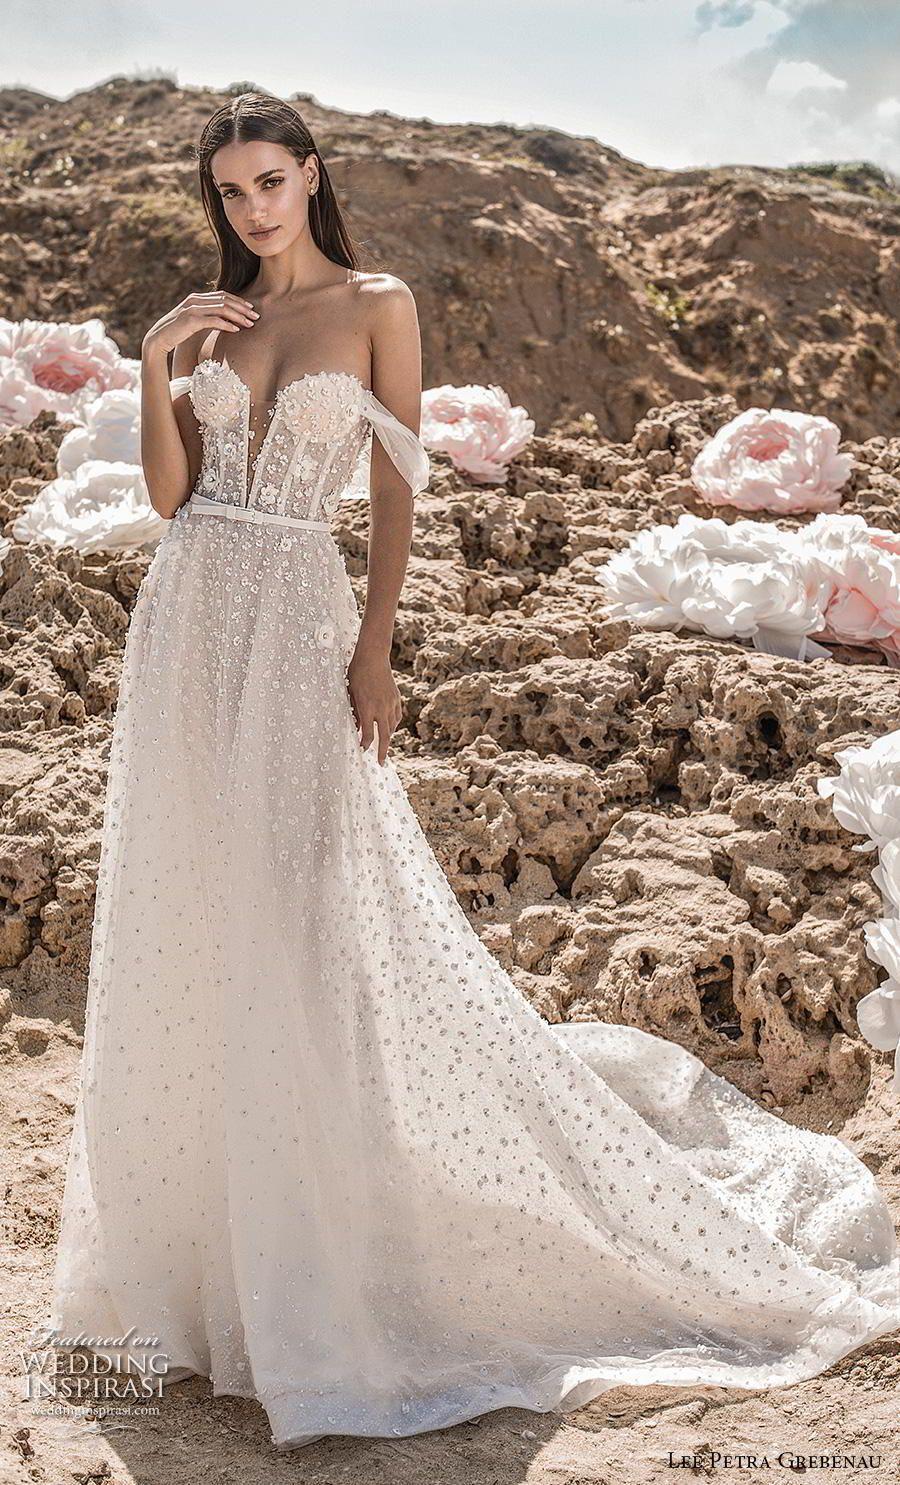 dda5a422dcaf Weddinginspirasi.com featuring - lee petra grebenau fall 2019 bridal off  the shoulder deep plunging sweetheart neckline full embellishment romantic  a line ...